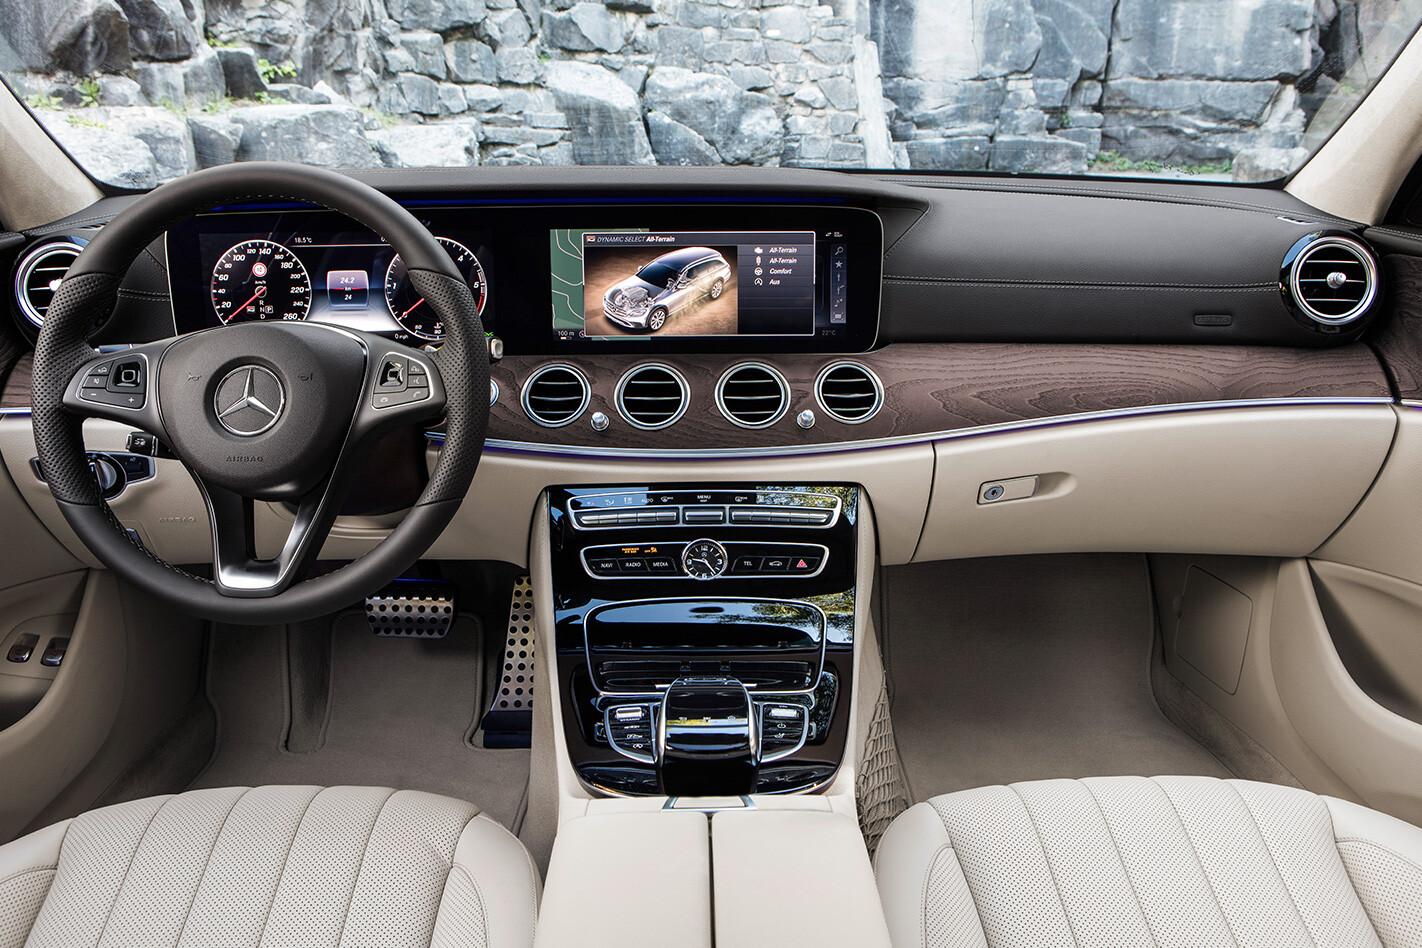 Mercedes Benz E 220 D All Terrain 2017 Interior Jpg